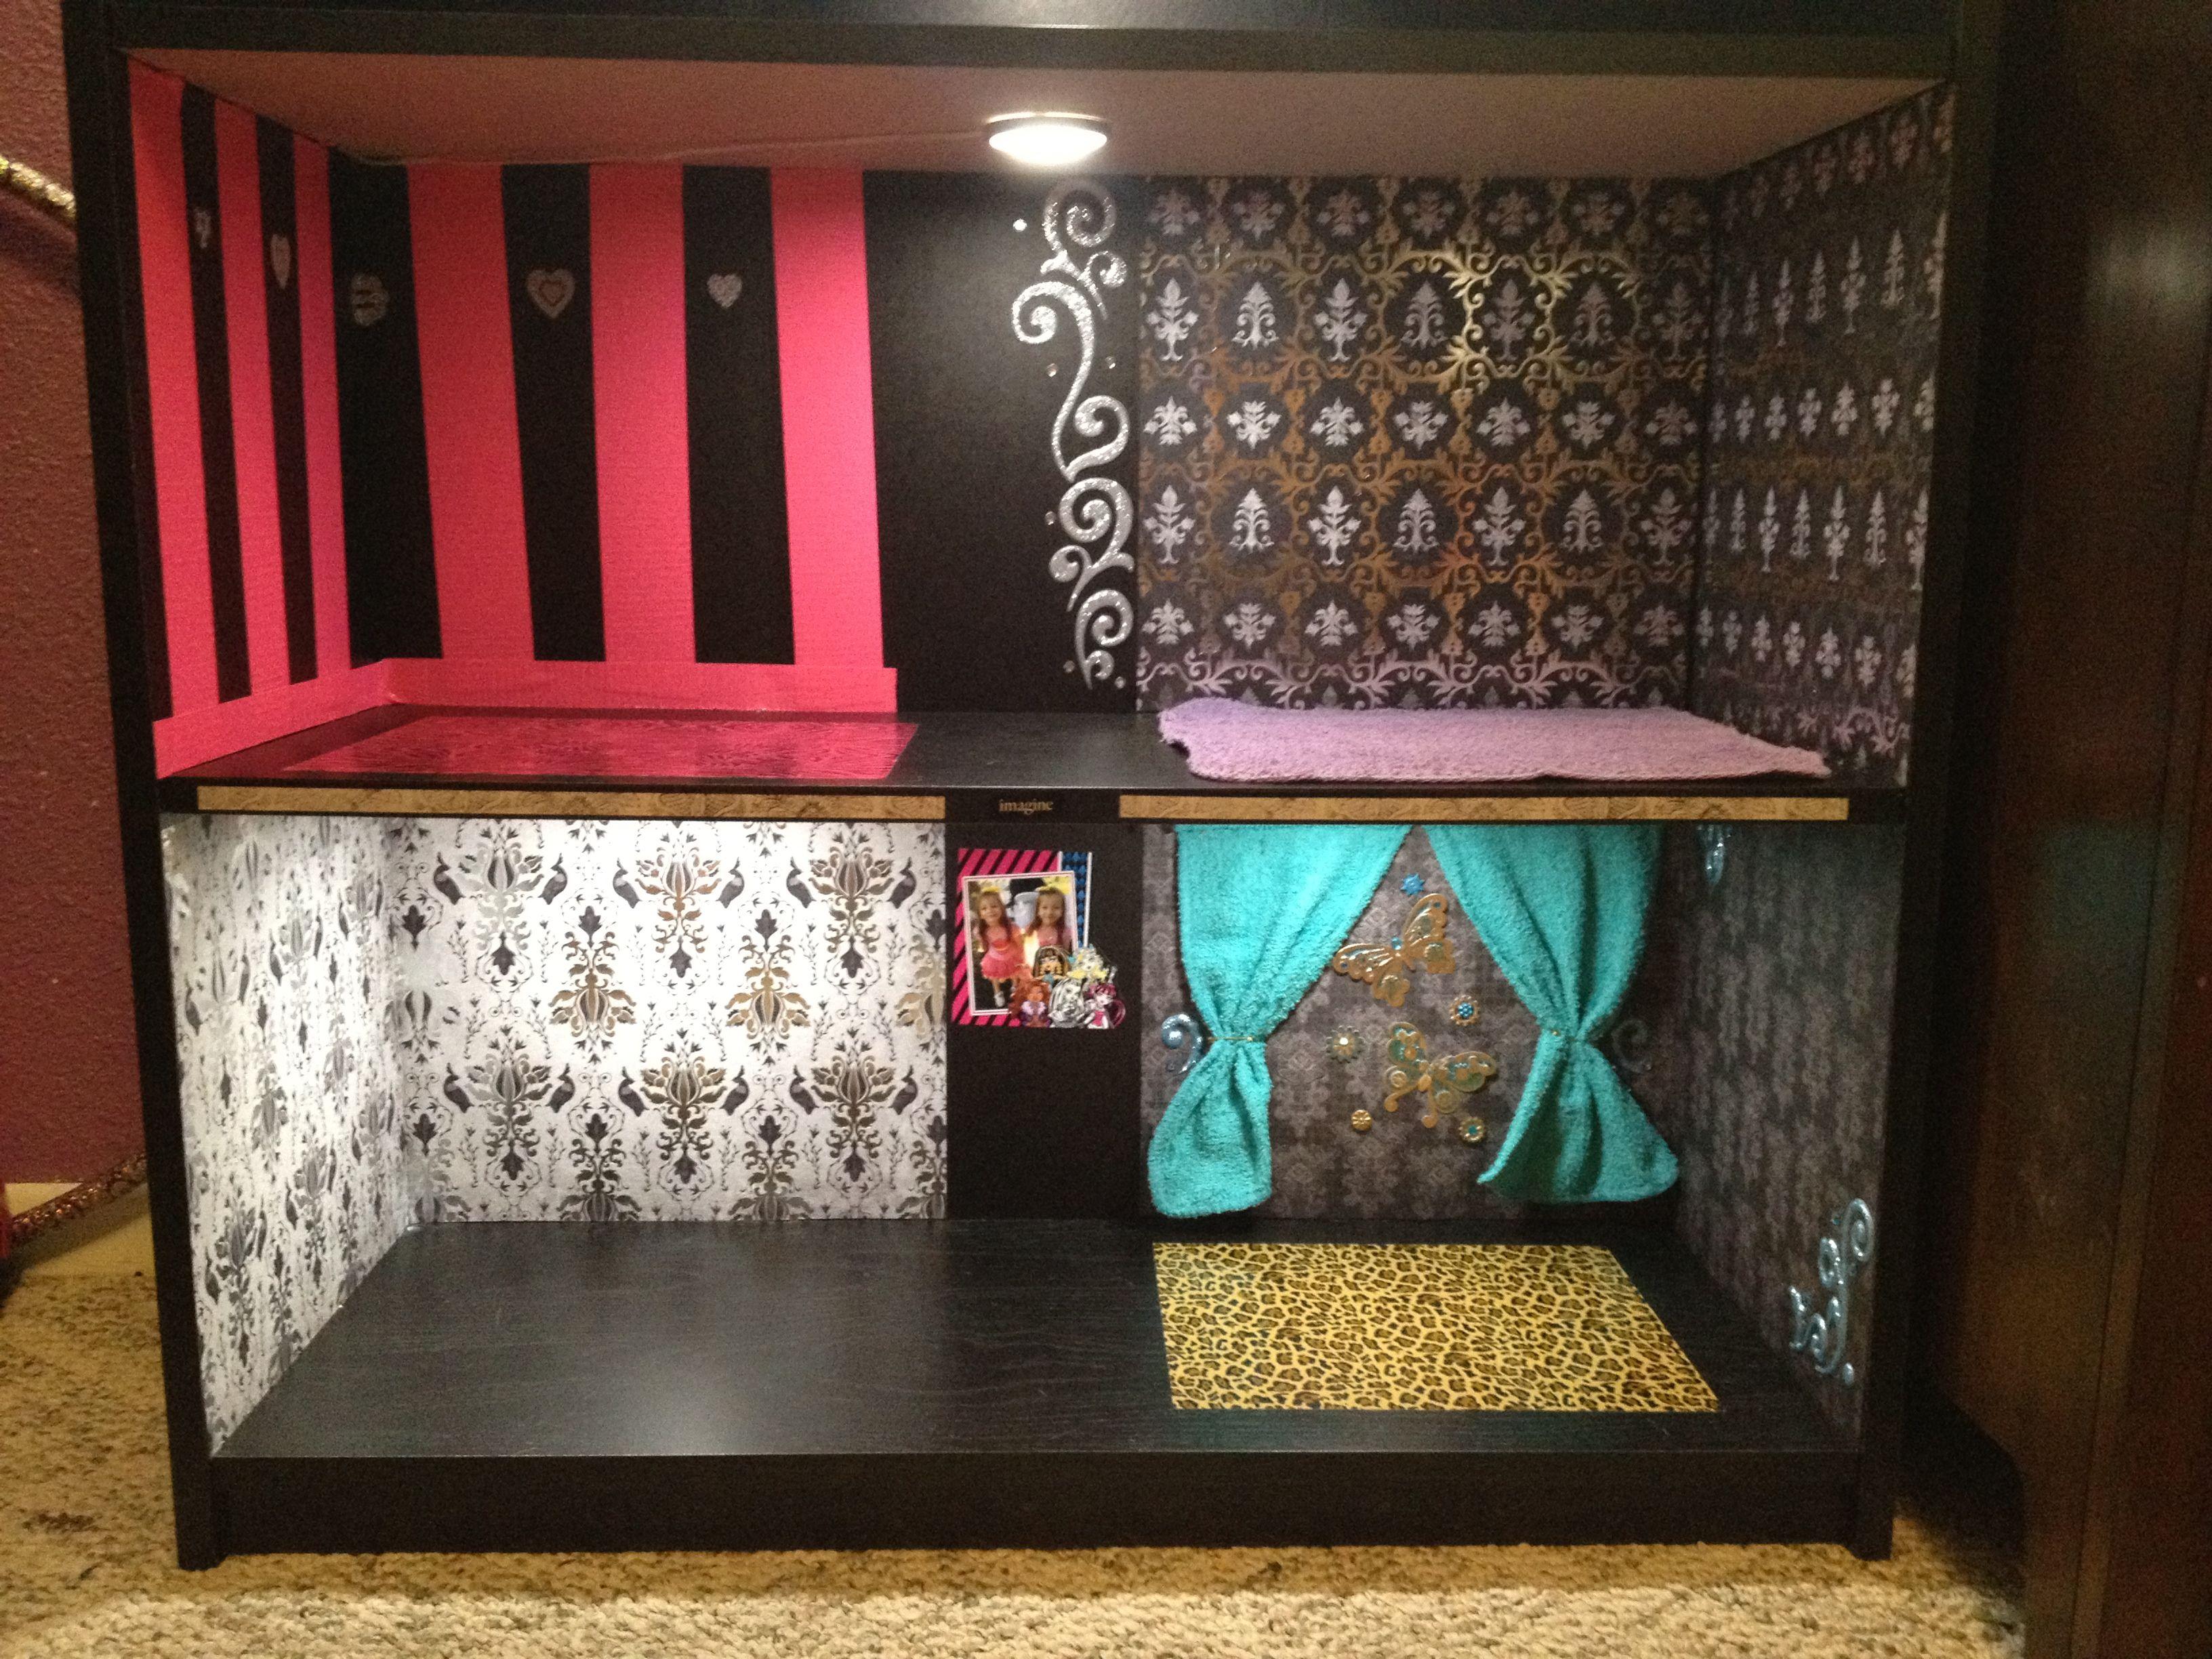 Monster High Diy Doll House With Lights Black Bookshelf